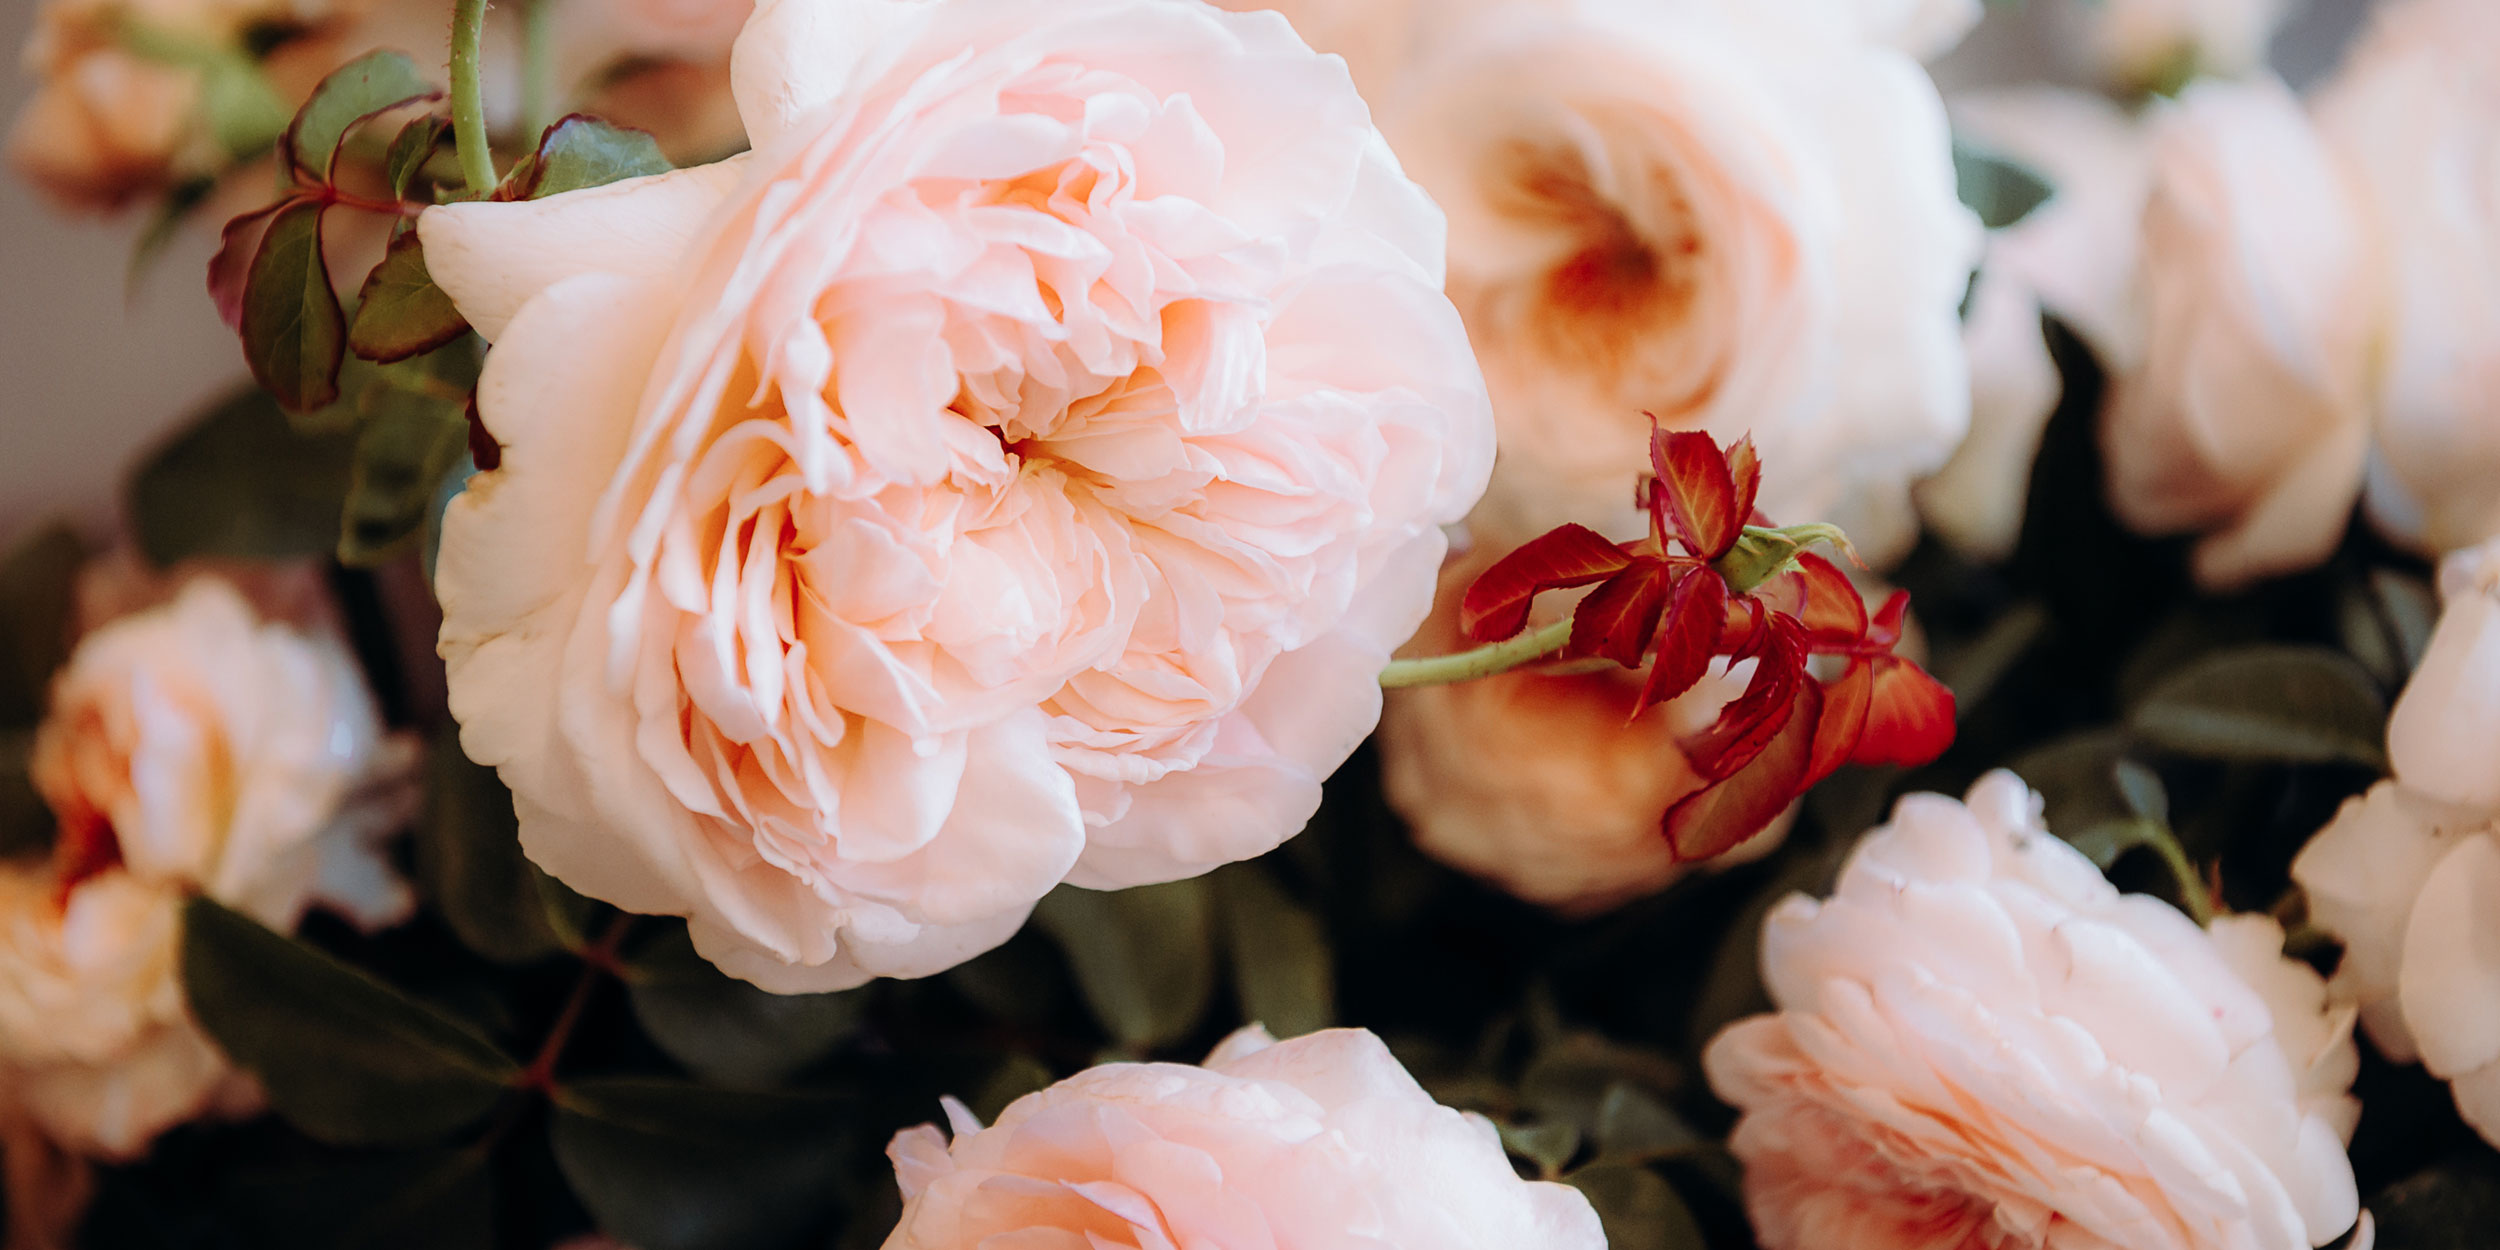 L_Flowers012.jpg